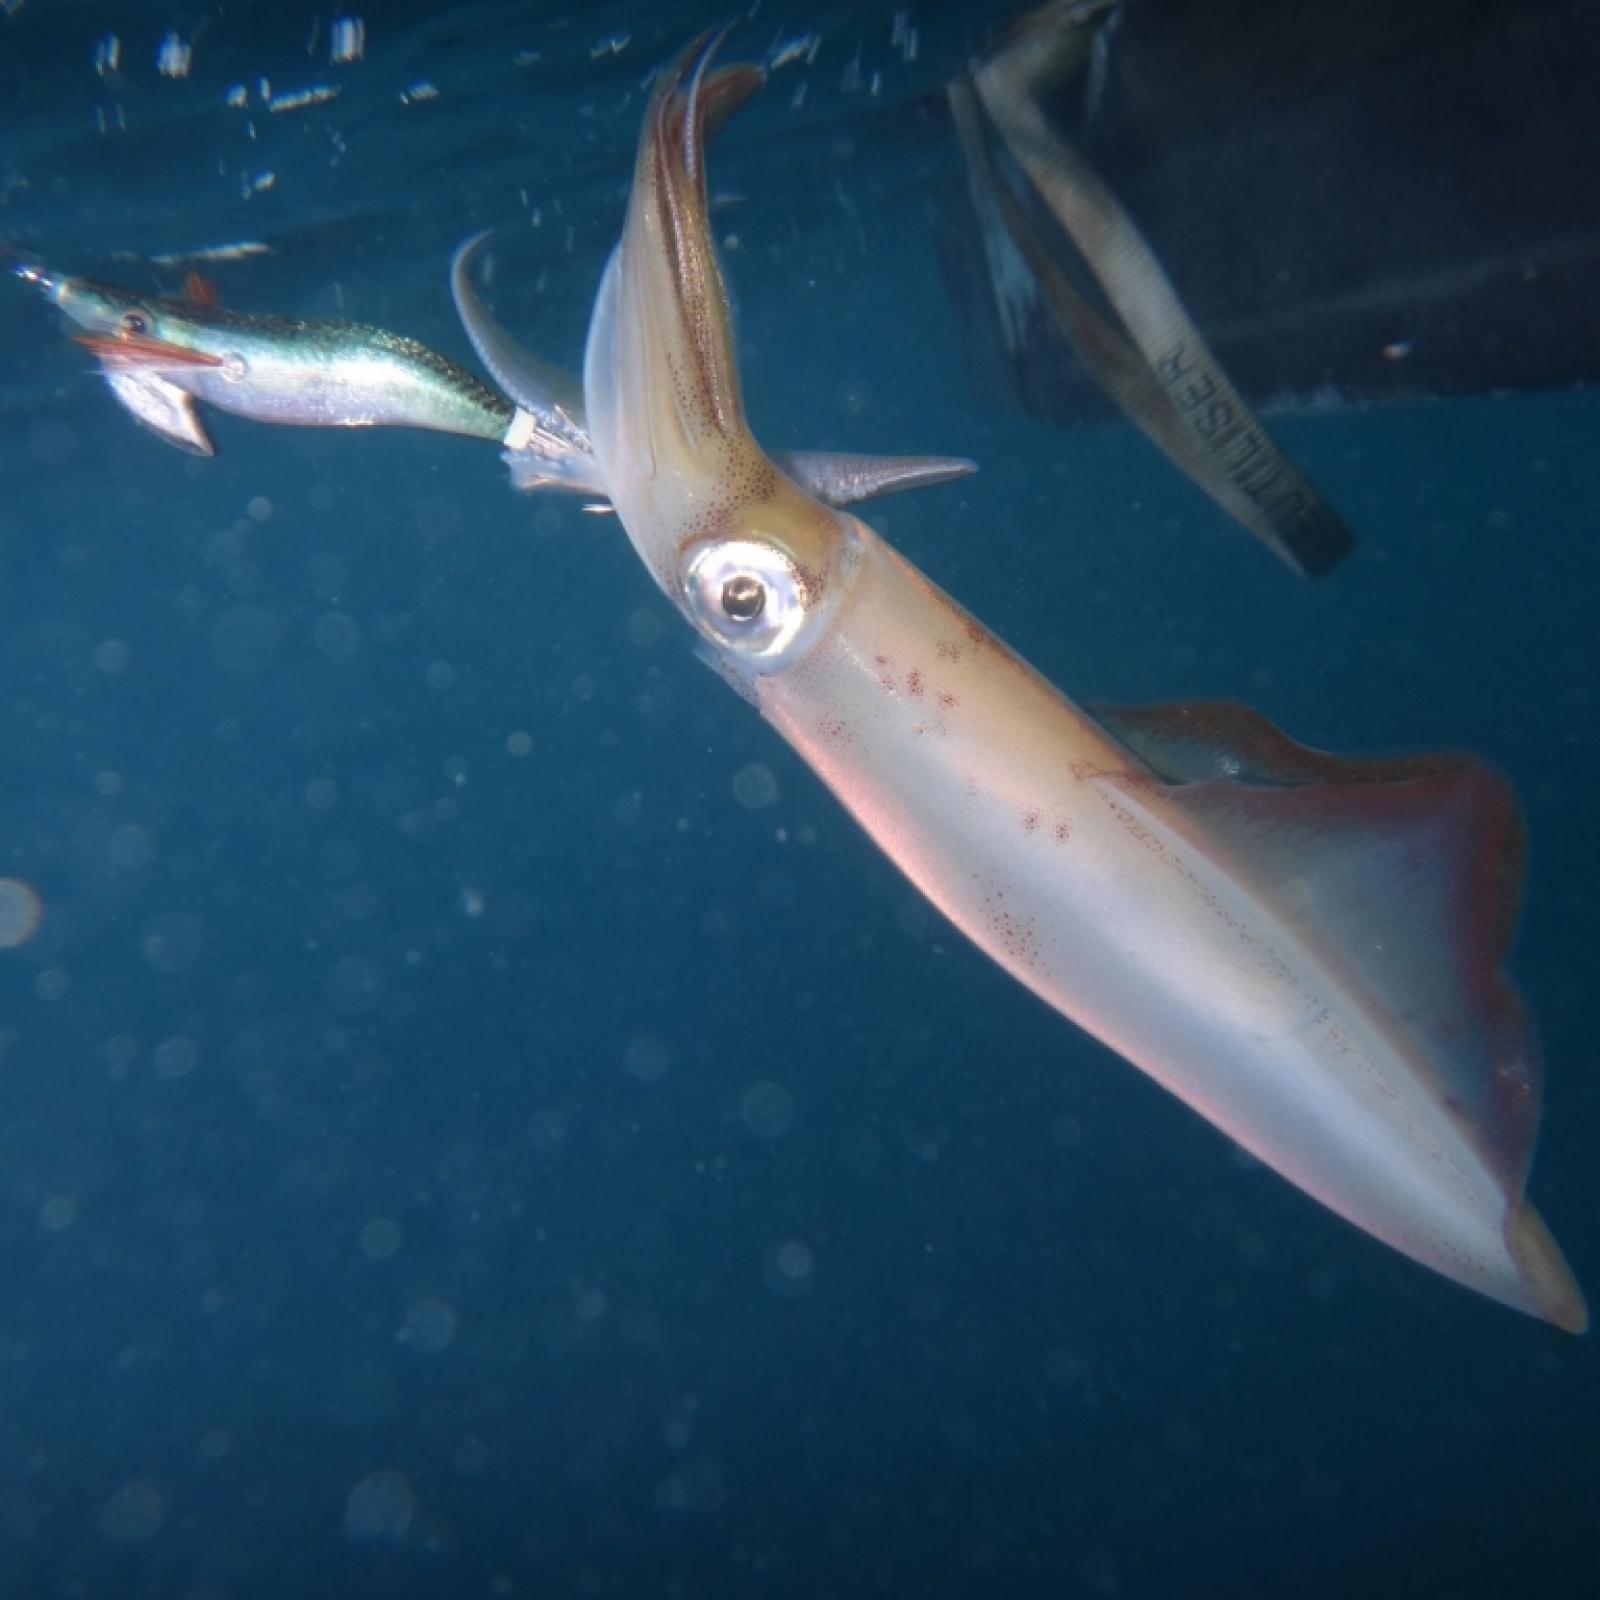 La pêche sur ijme